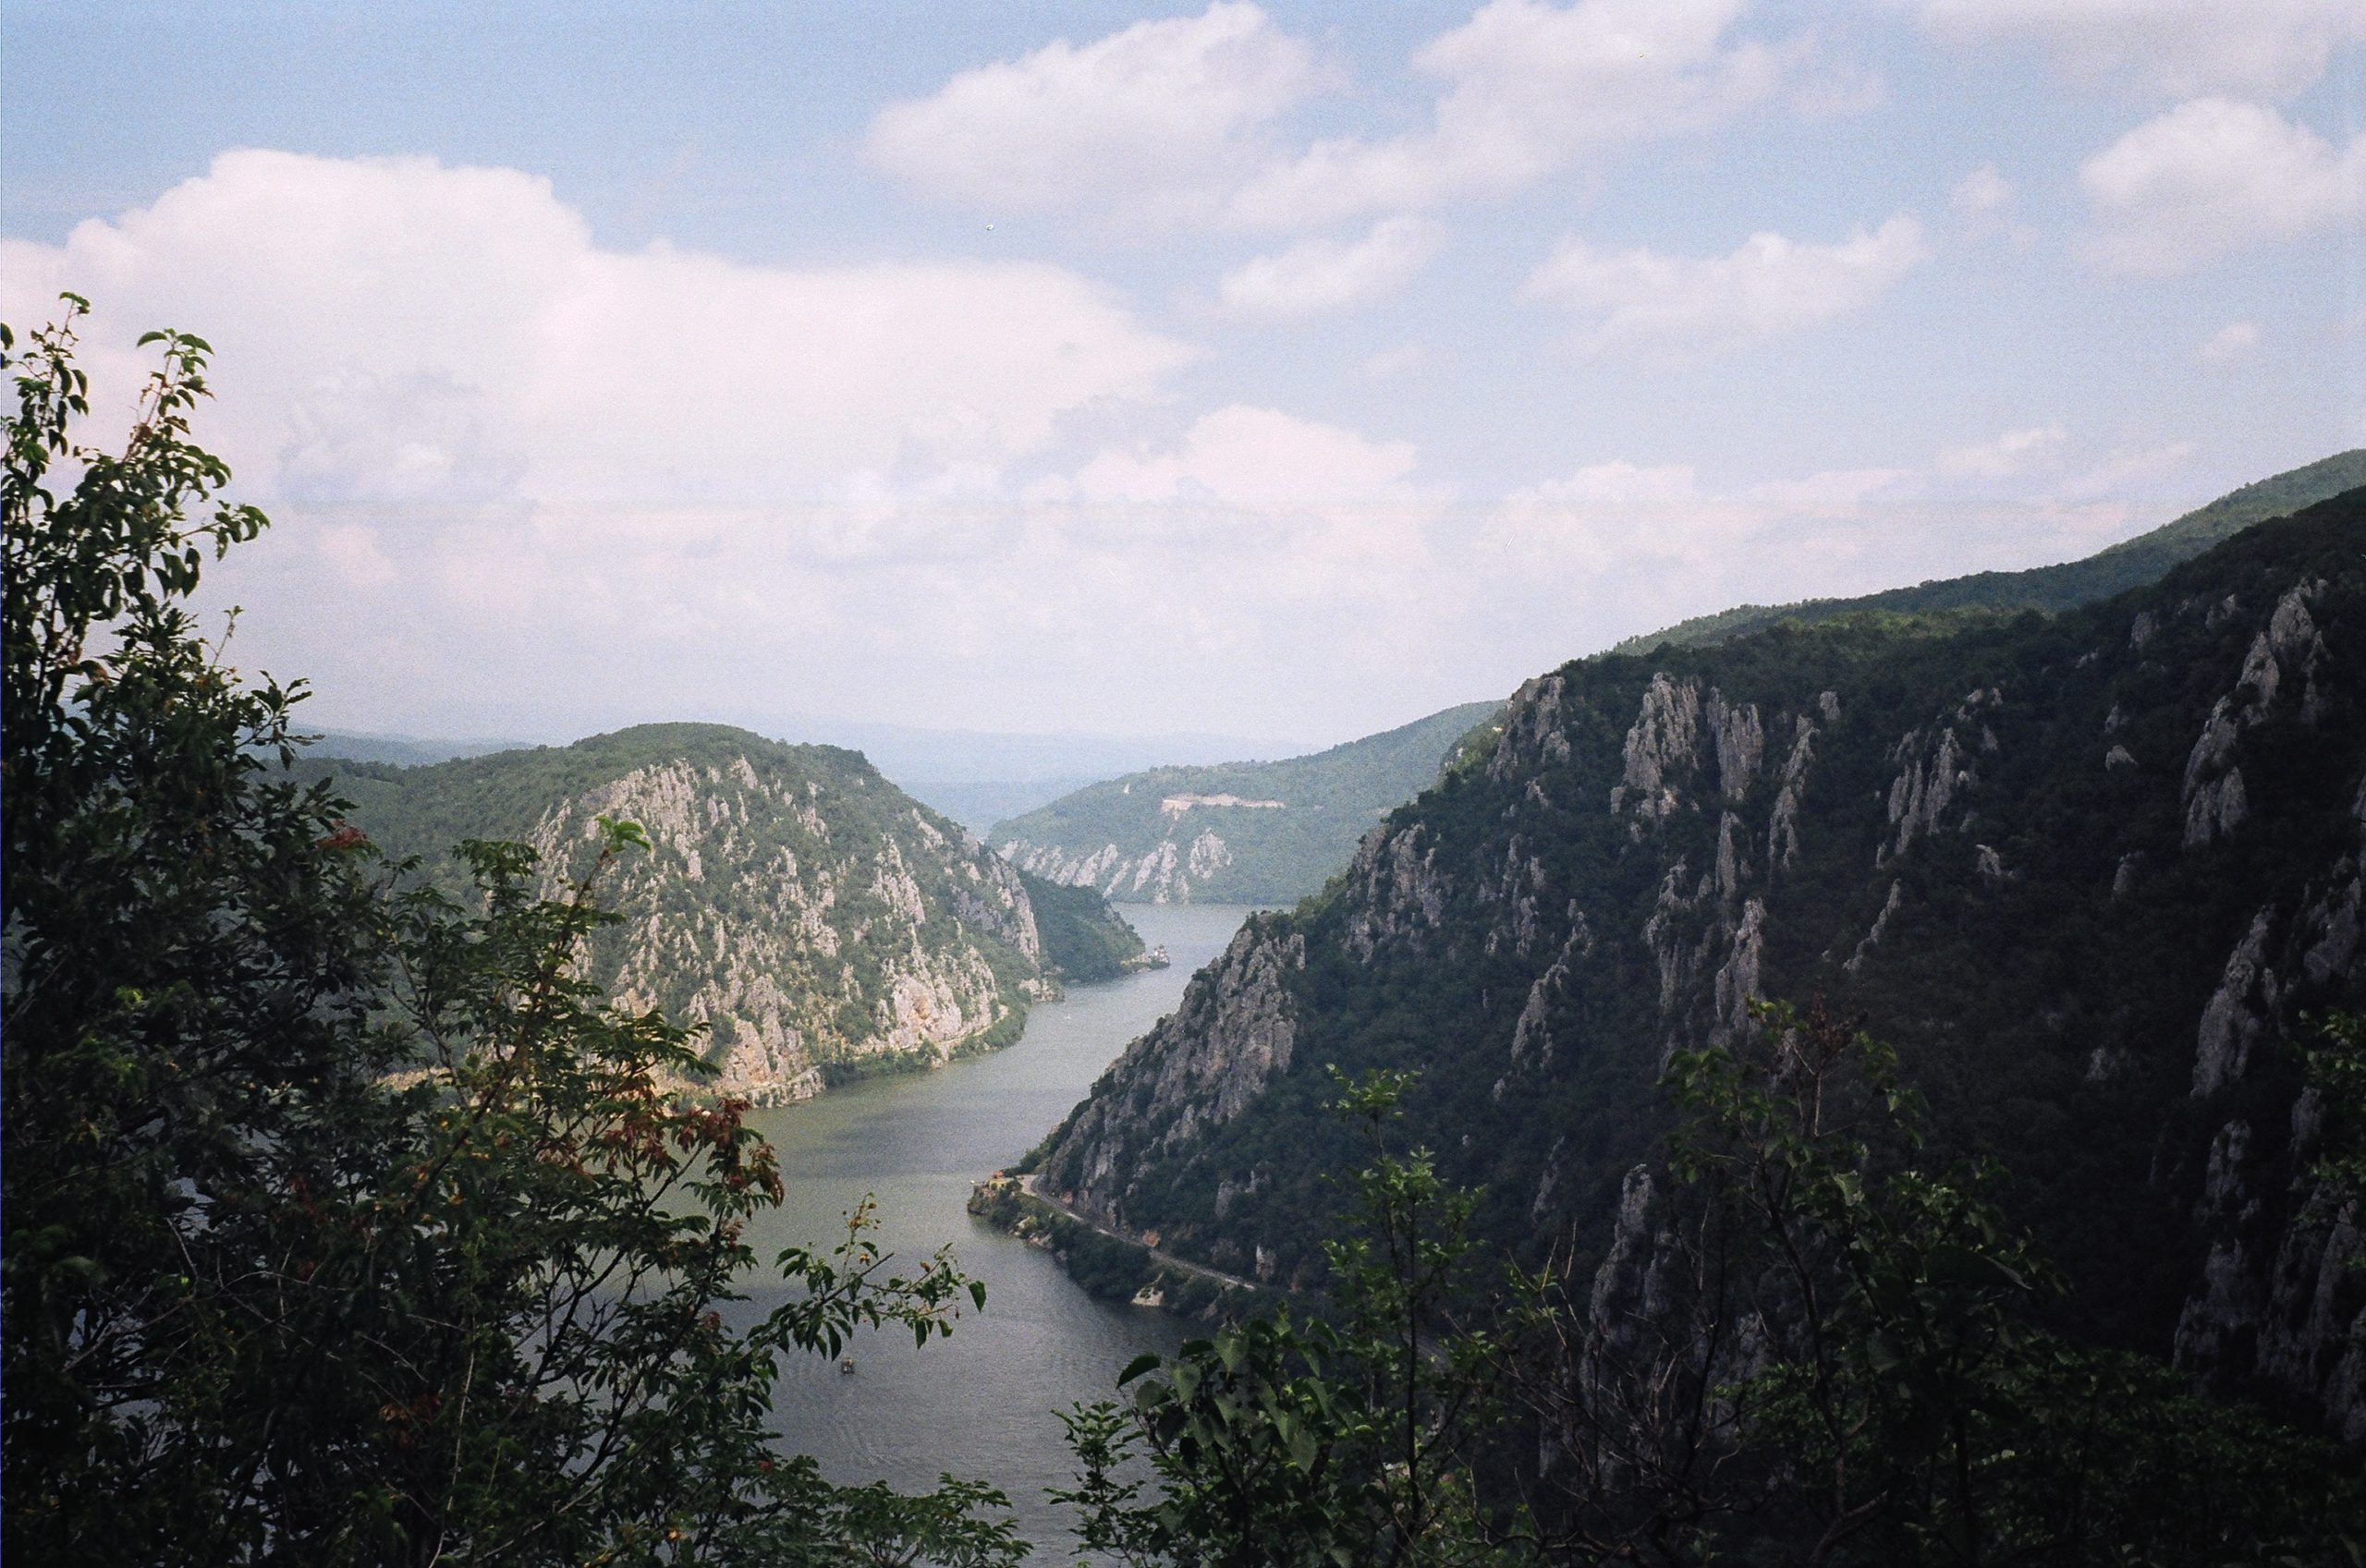 Danube Gorge - Romania - We Roam Europe (6)